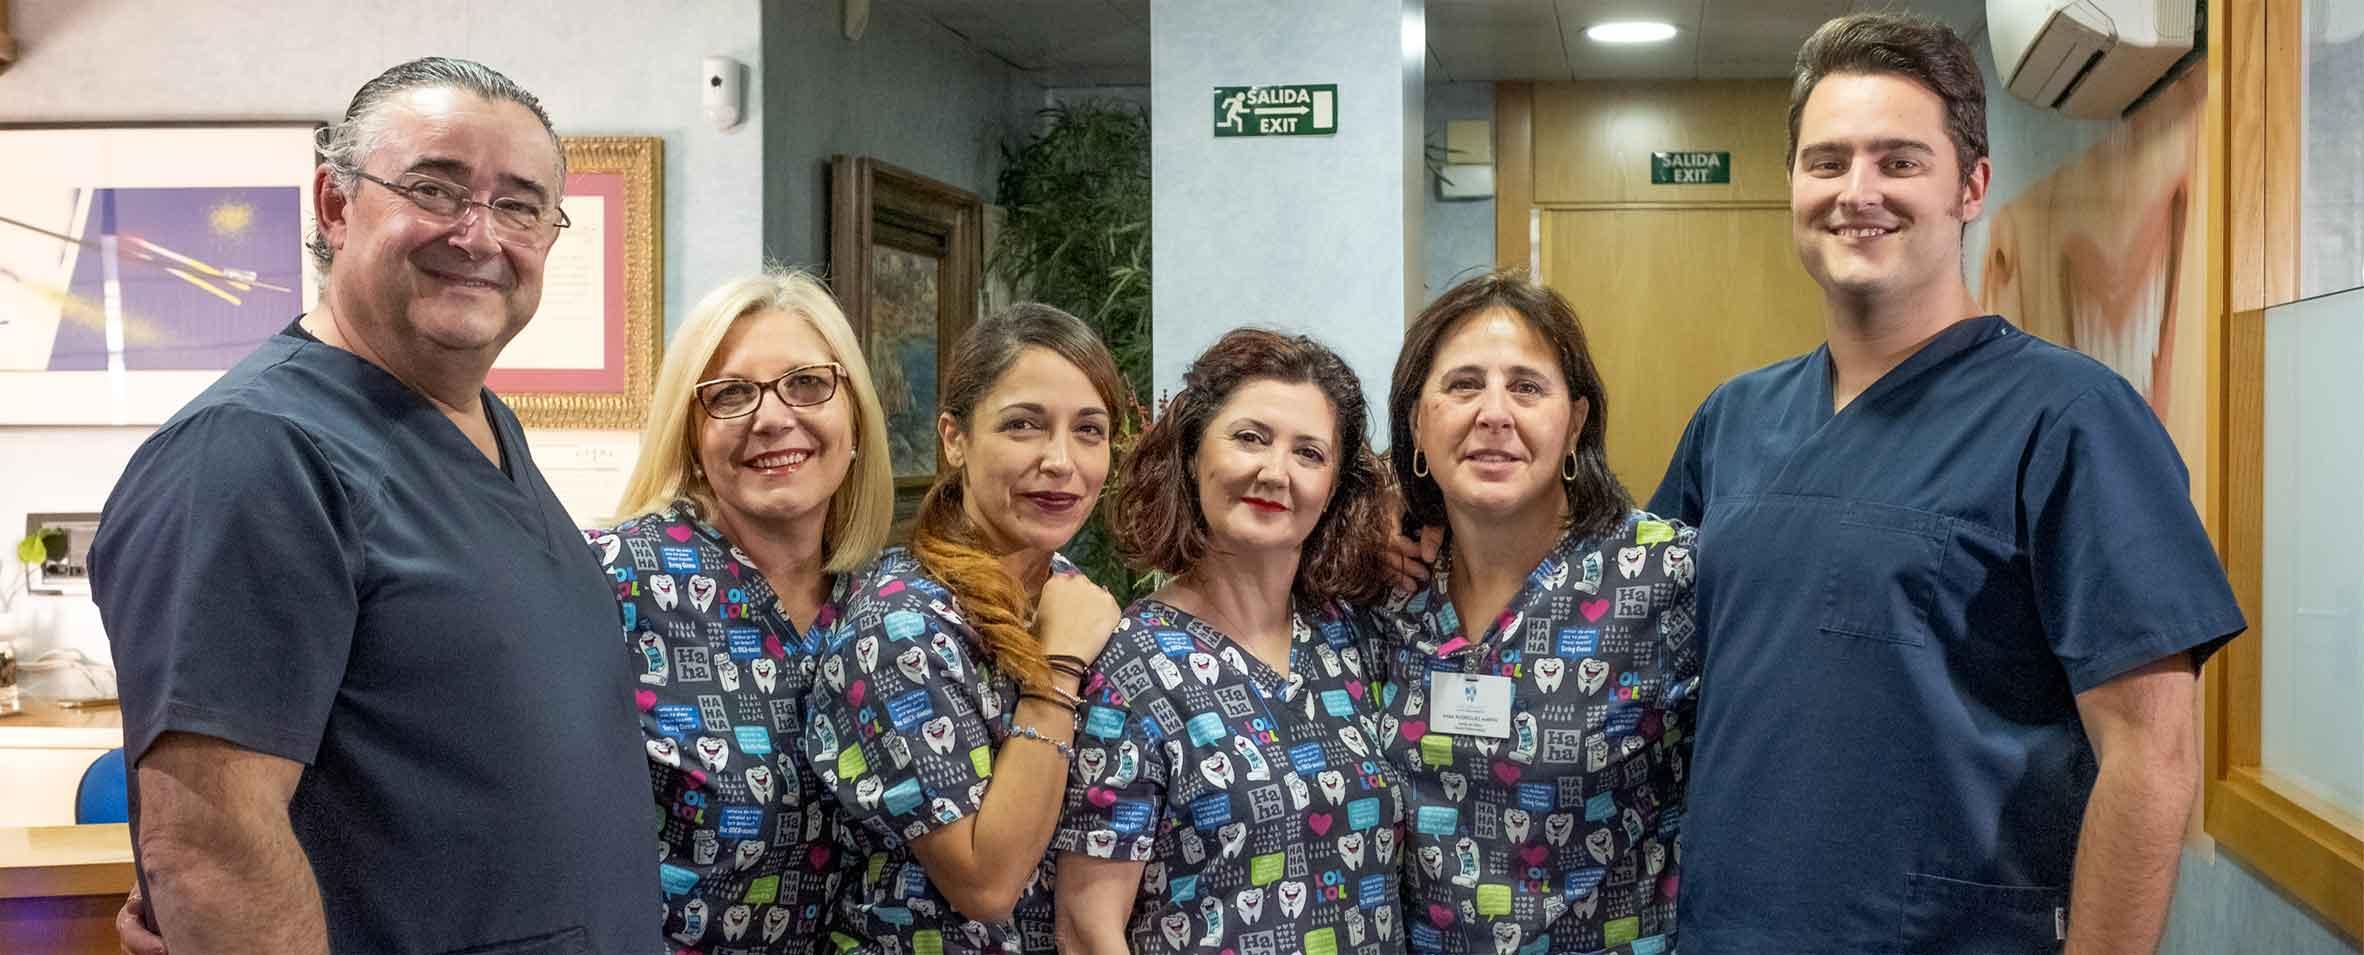 nosotros-murcia-clinica-dental-mas-bermejo-dentista-www.clinicamasbermejo.com